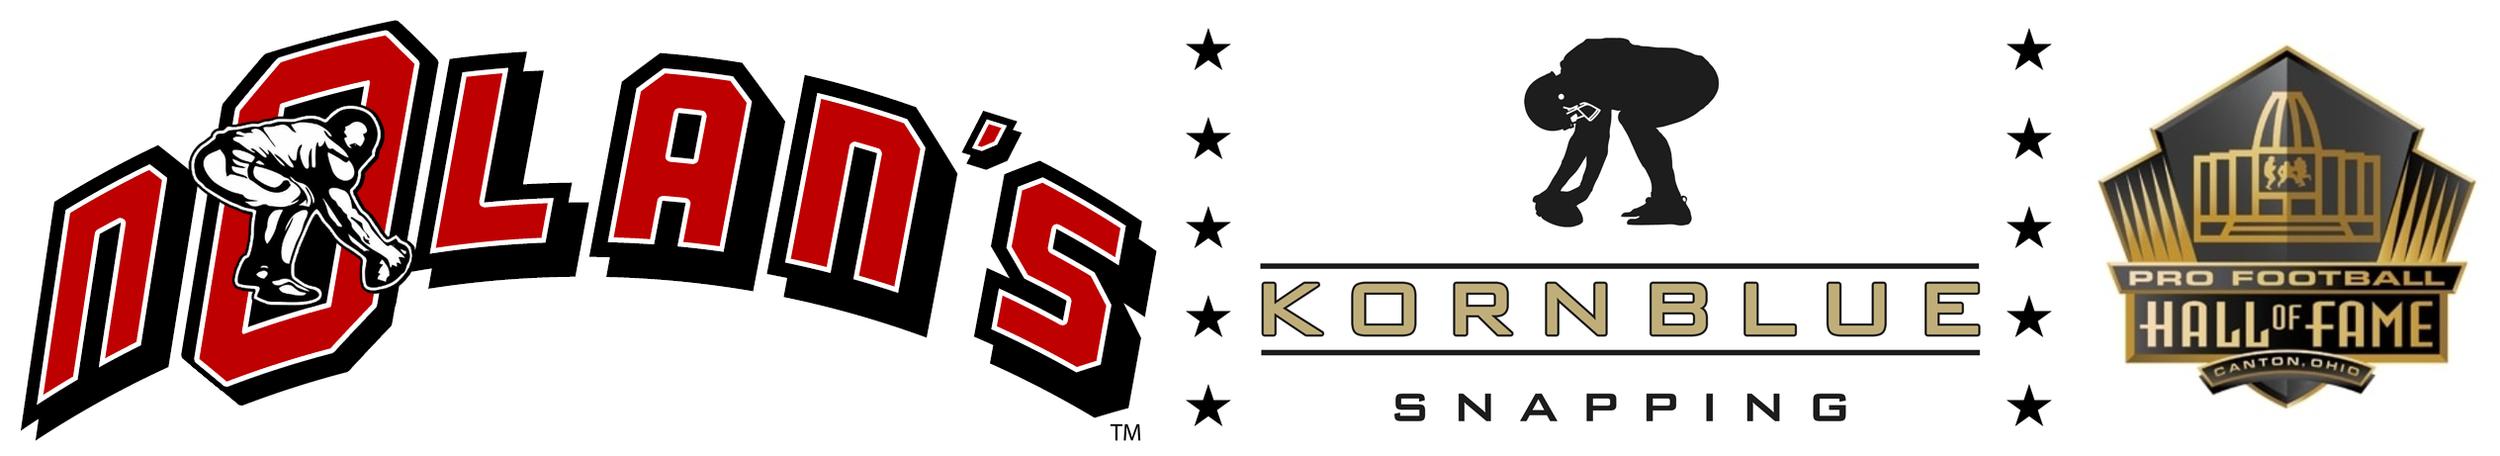 Nolan's-Long-Snapping-Kornblue-Pro-FB-HOF-Partnership.png